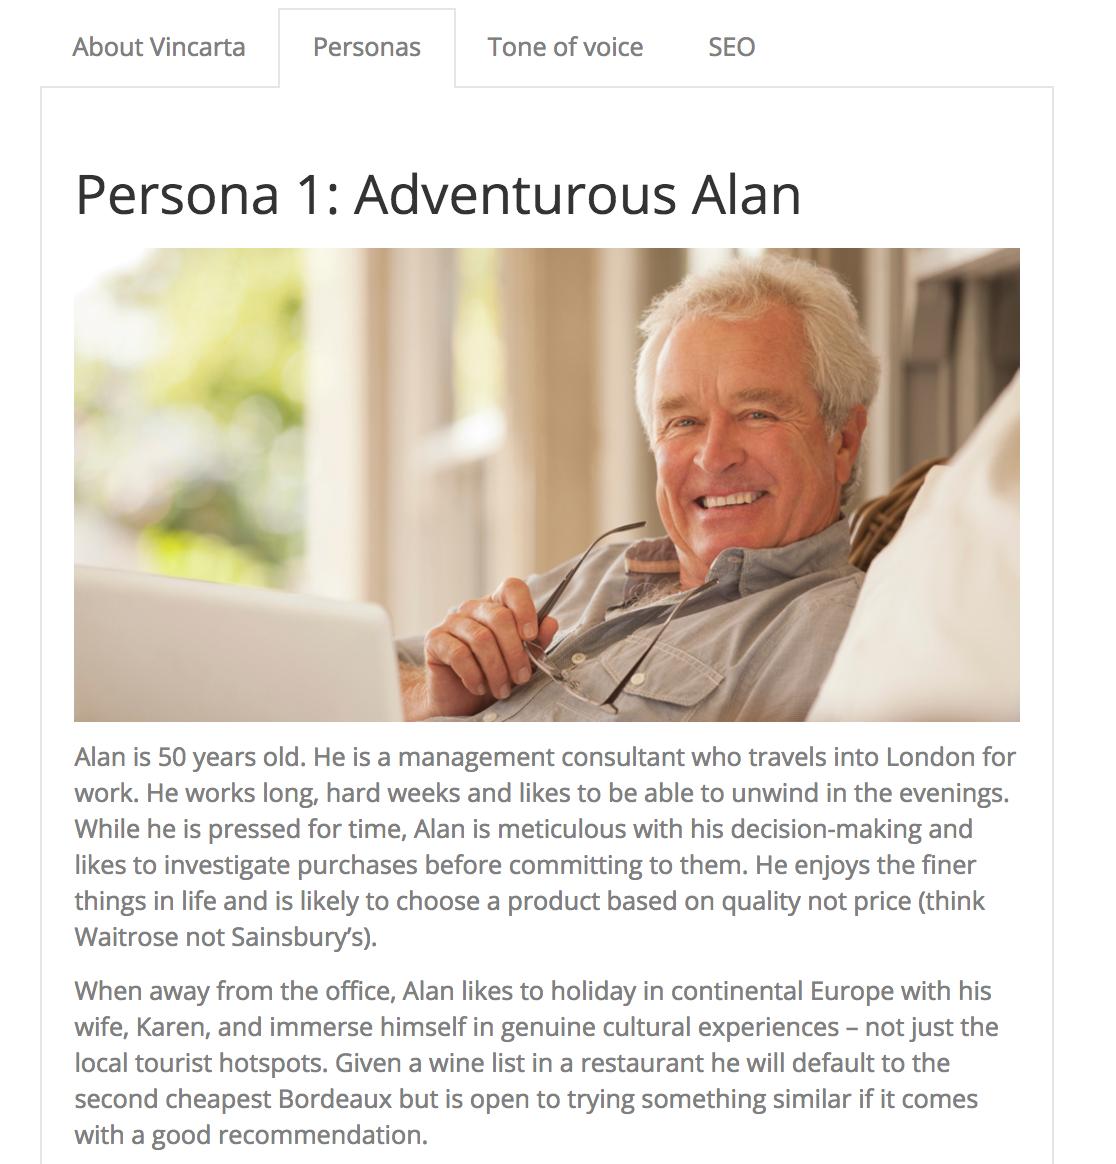 Adventurous Alan persona for Vincarta